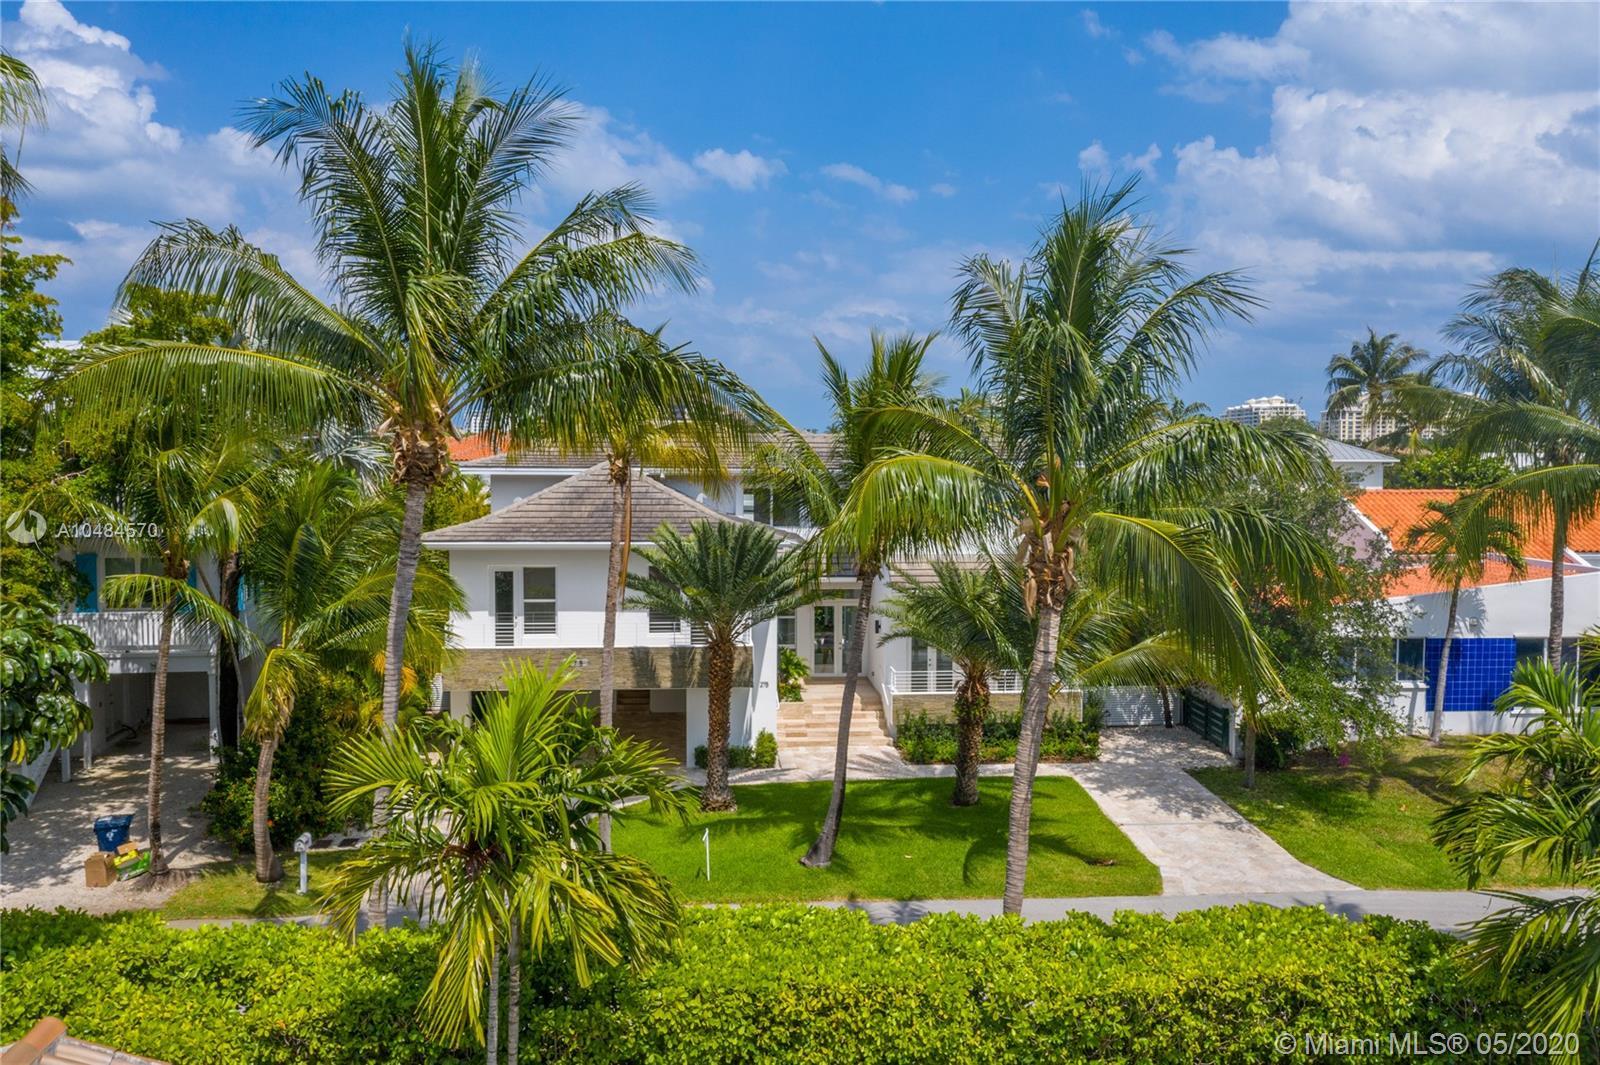 Tropical Isle Homes - 275 Hampton Ln, Miami, FL 33149